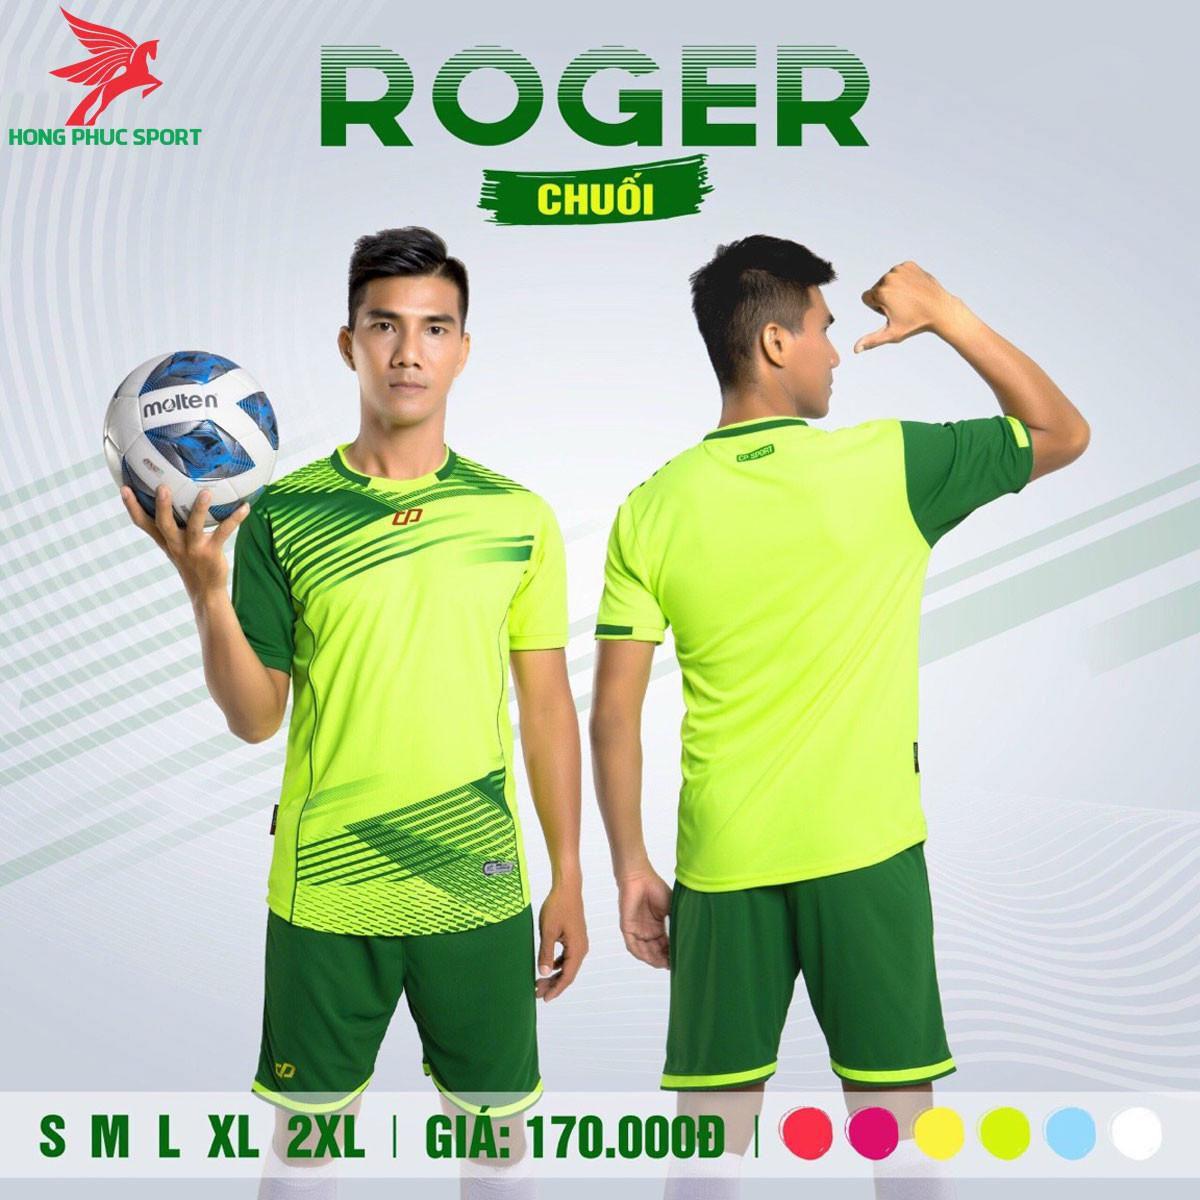 https://cdn.hongphucsport.com/unsafe/s4.shopbay.vn/files/285/ao-bong-da-khong-logo-cp-roger-2021-mau-xanh-chuoi-6052d59d95191.jpg